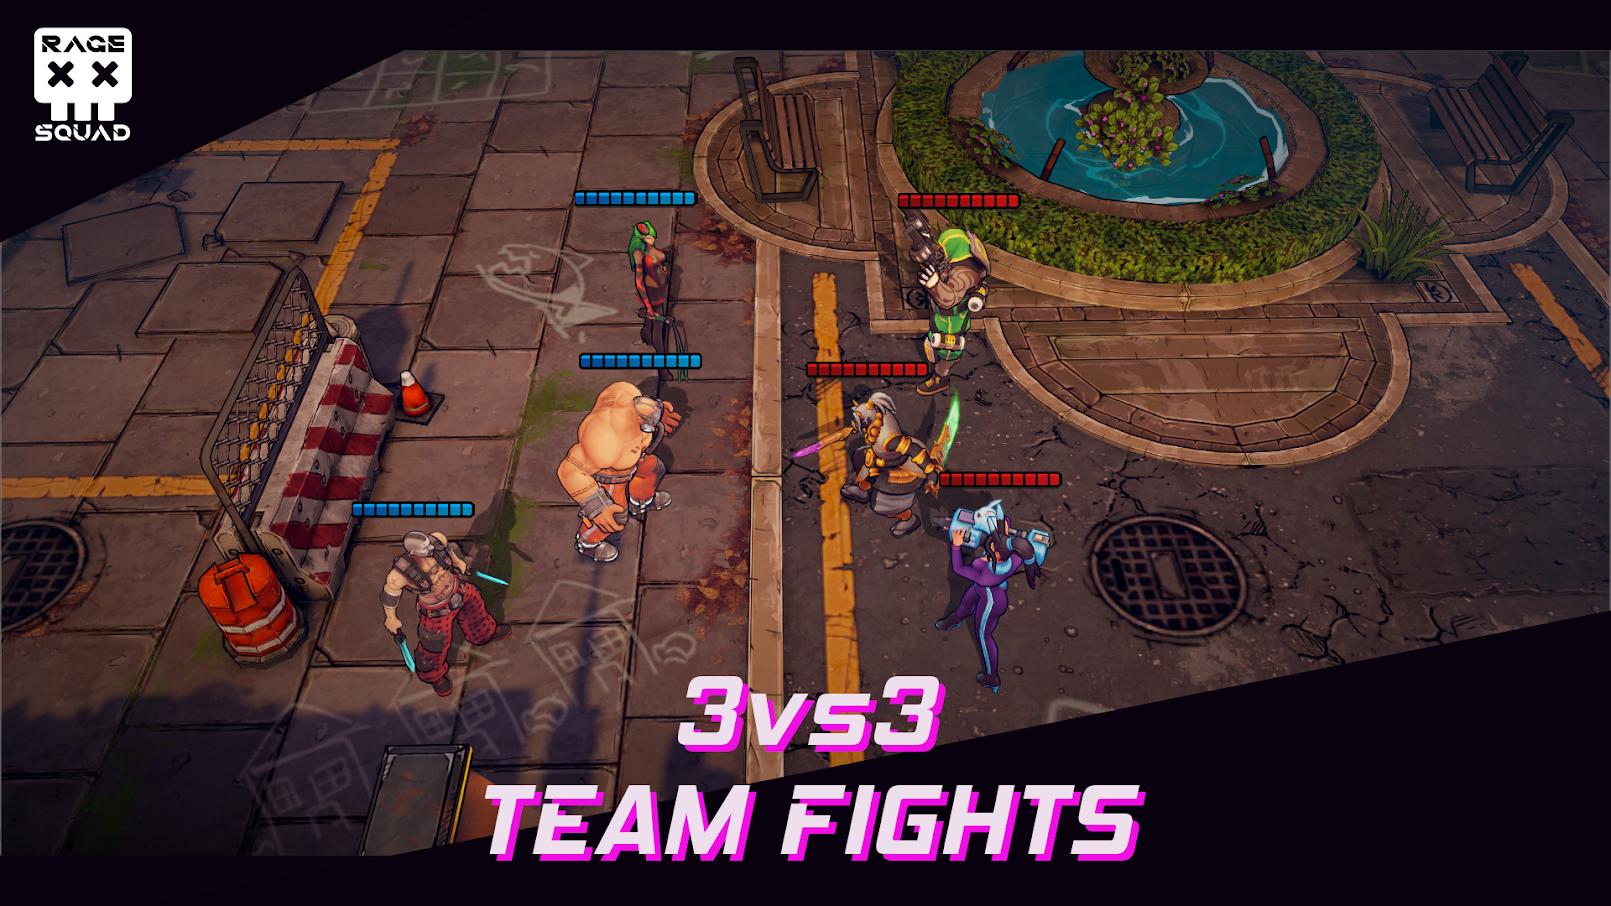 Rage Squad